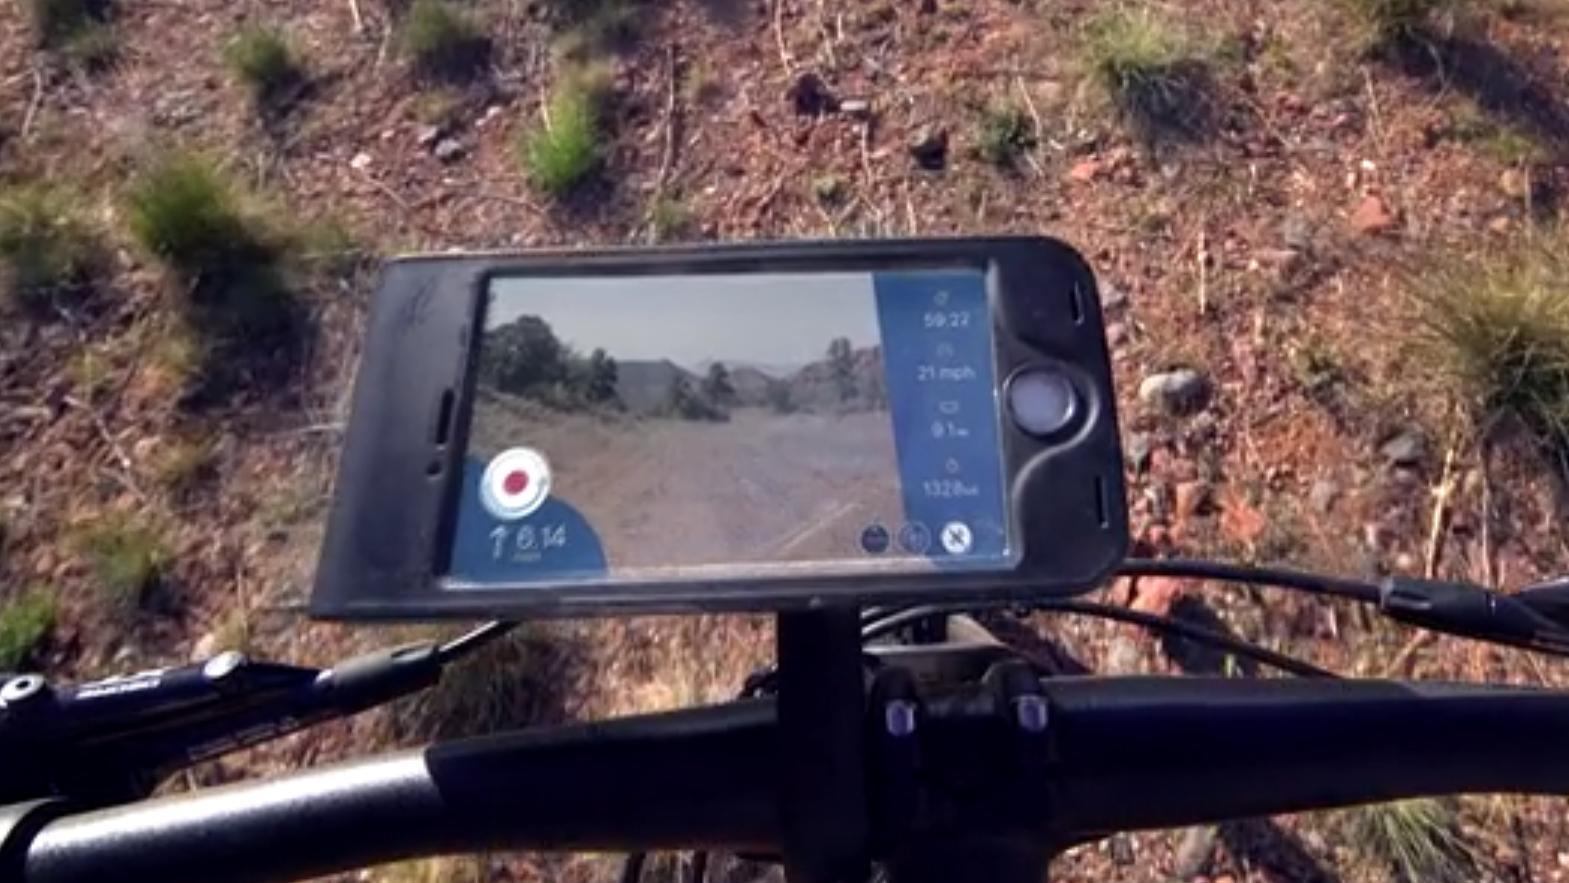 Med denne kan du forvandle iPhone til en fullverdig sykkelcomputer